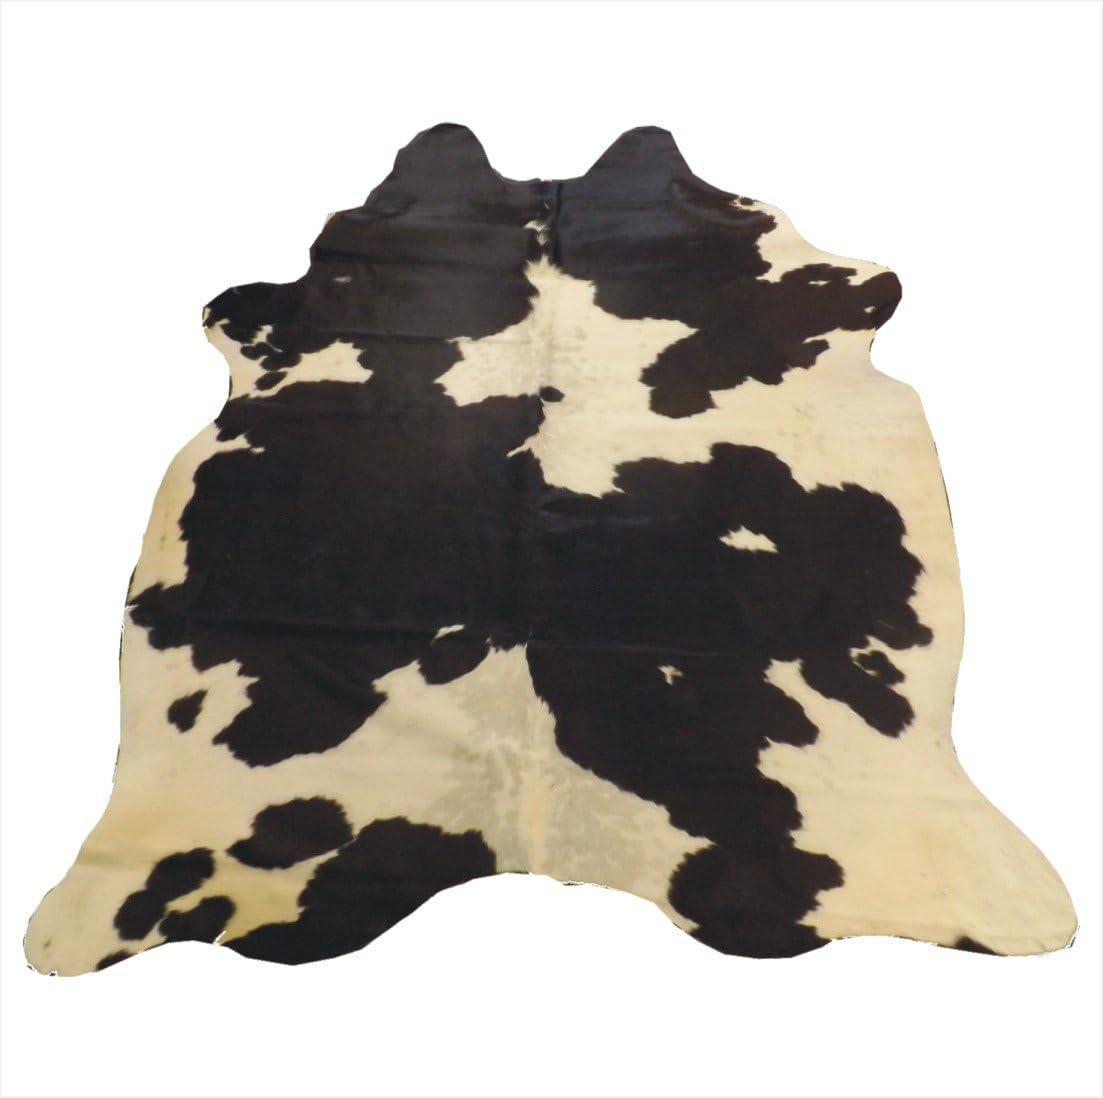 Hilason Hair-On Leather Pure Brazillian Cowhide Skin Rug Carpet Black And White